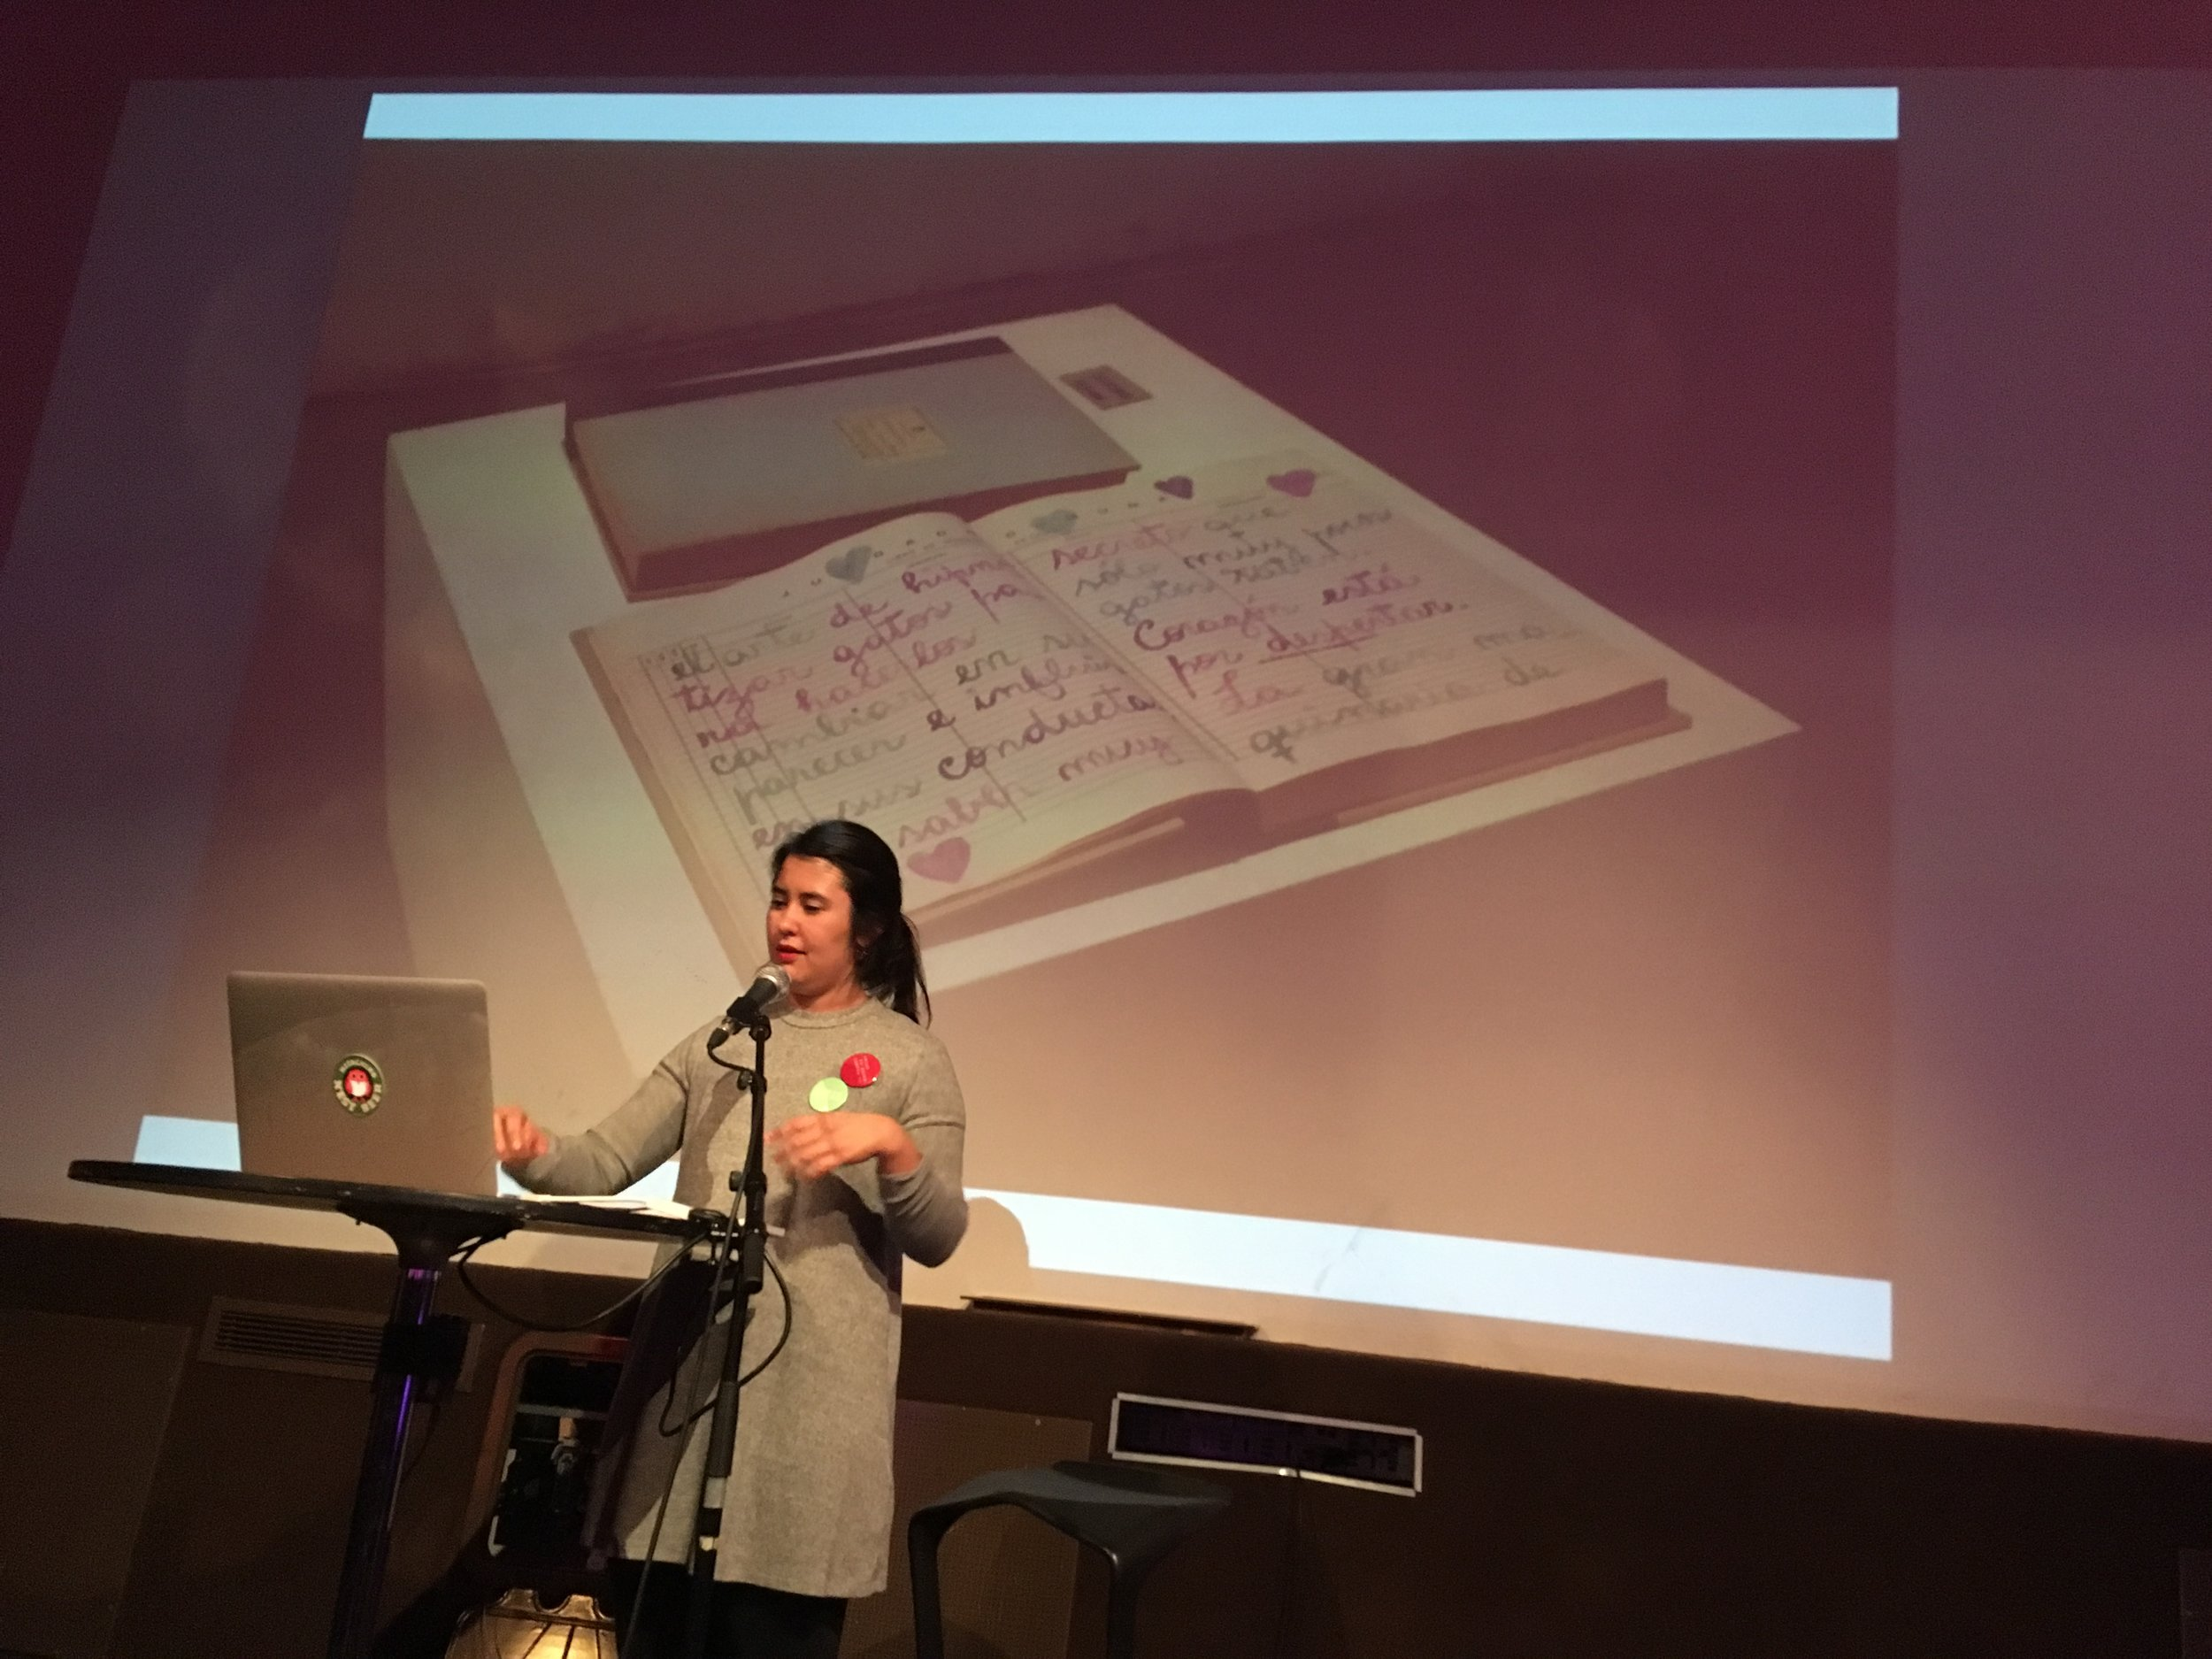 AAPIE's presentation at BABF 2017